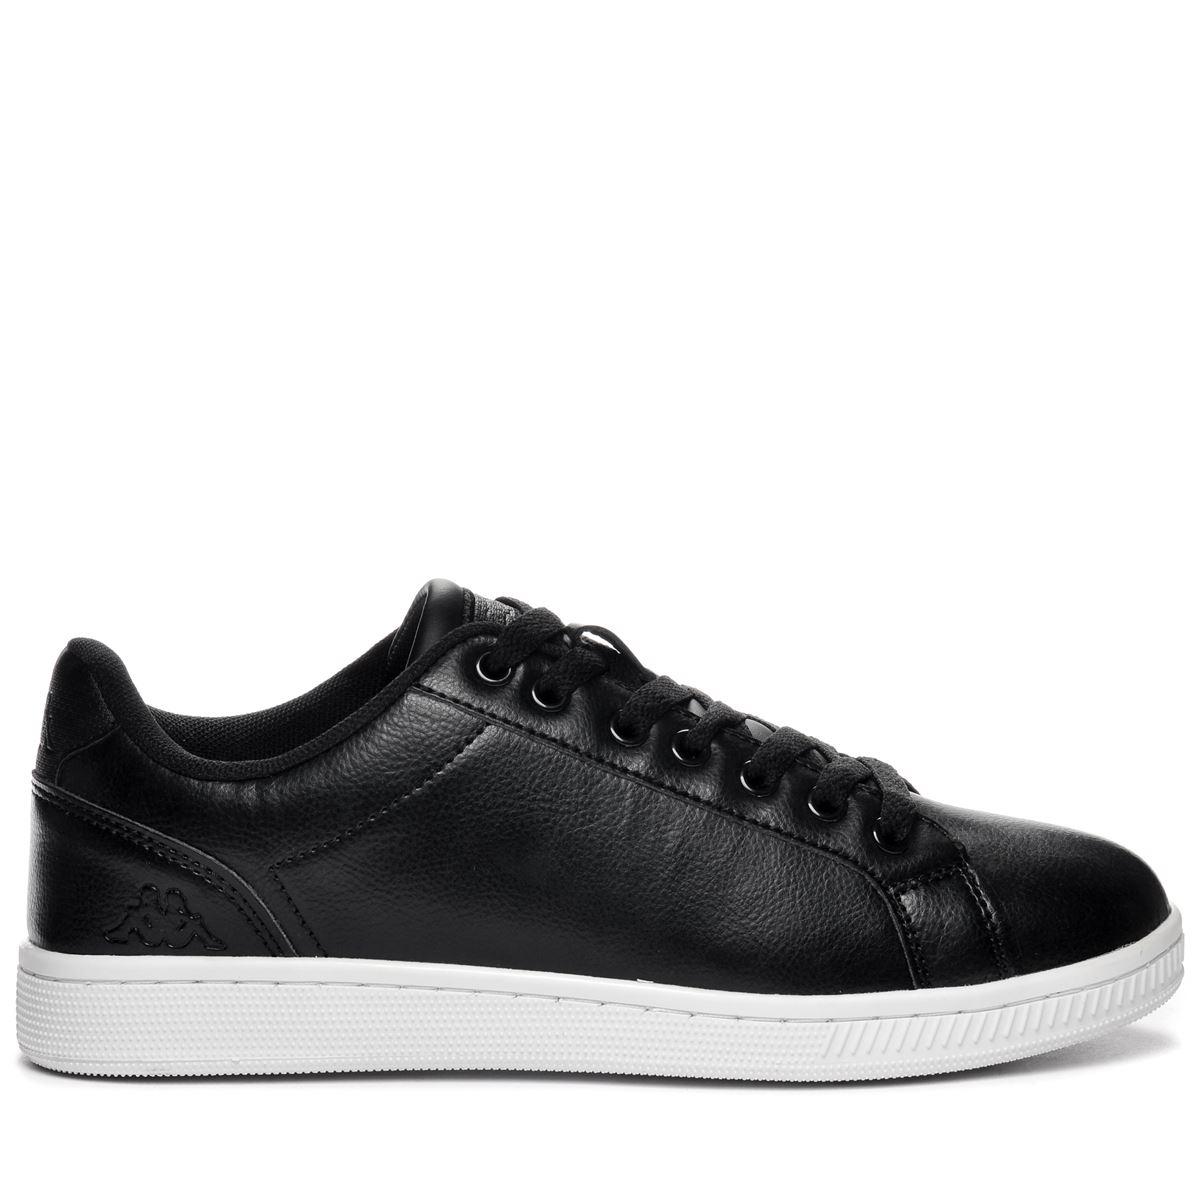 Kappa-Scarpe-Sneakers-Uomo-Donna-LOGO-GALTER-5-Camminata-Basso miniatuur 2